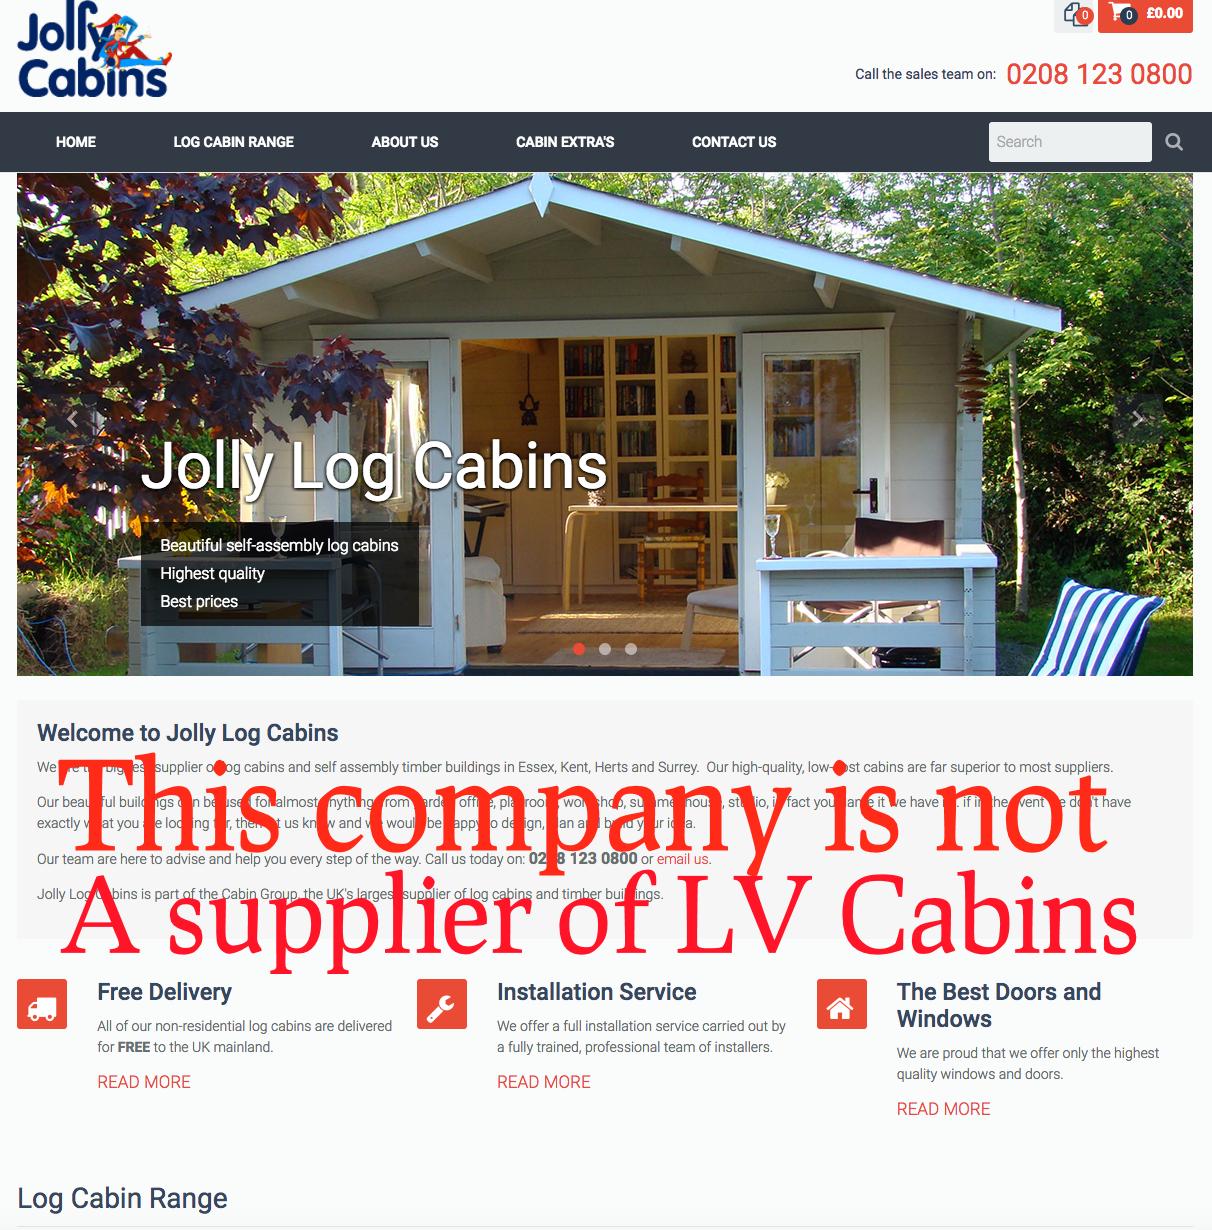 jolly cabins fraud